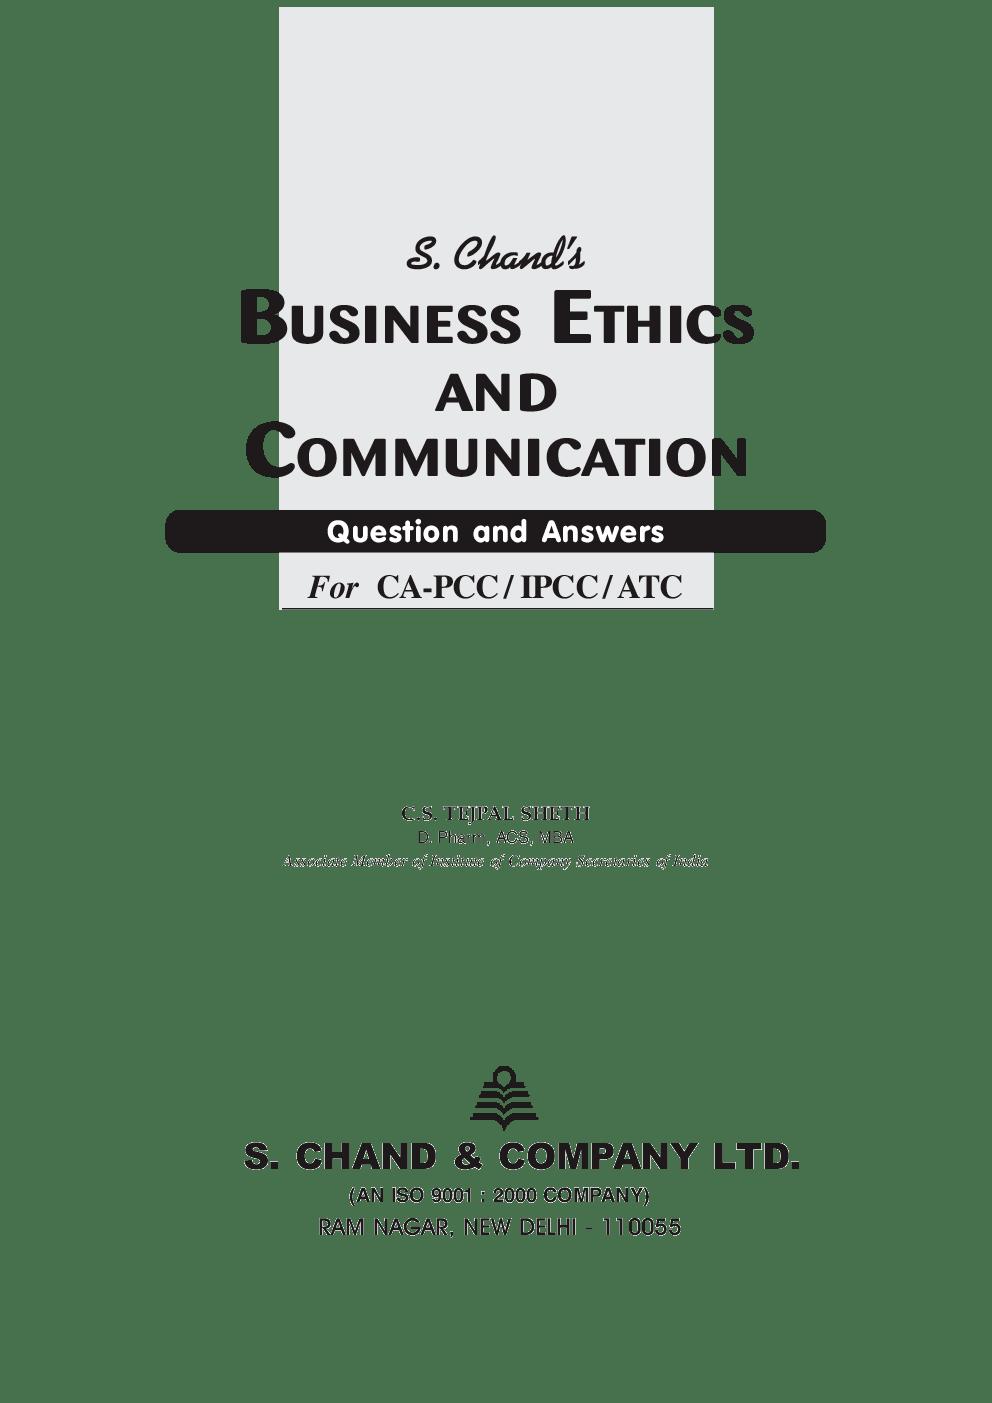 Download Business Ethics And Communication (CA-PCC / IPCC